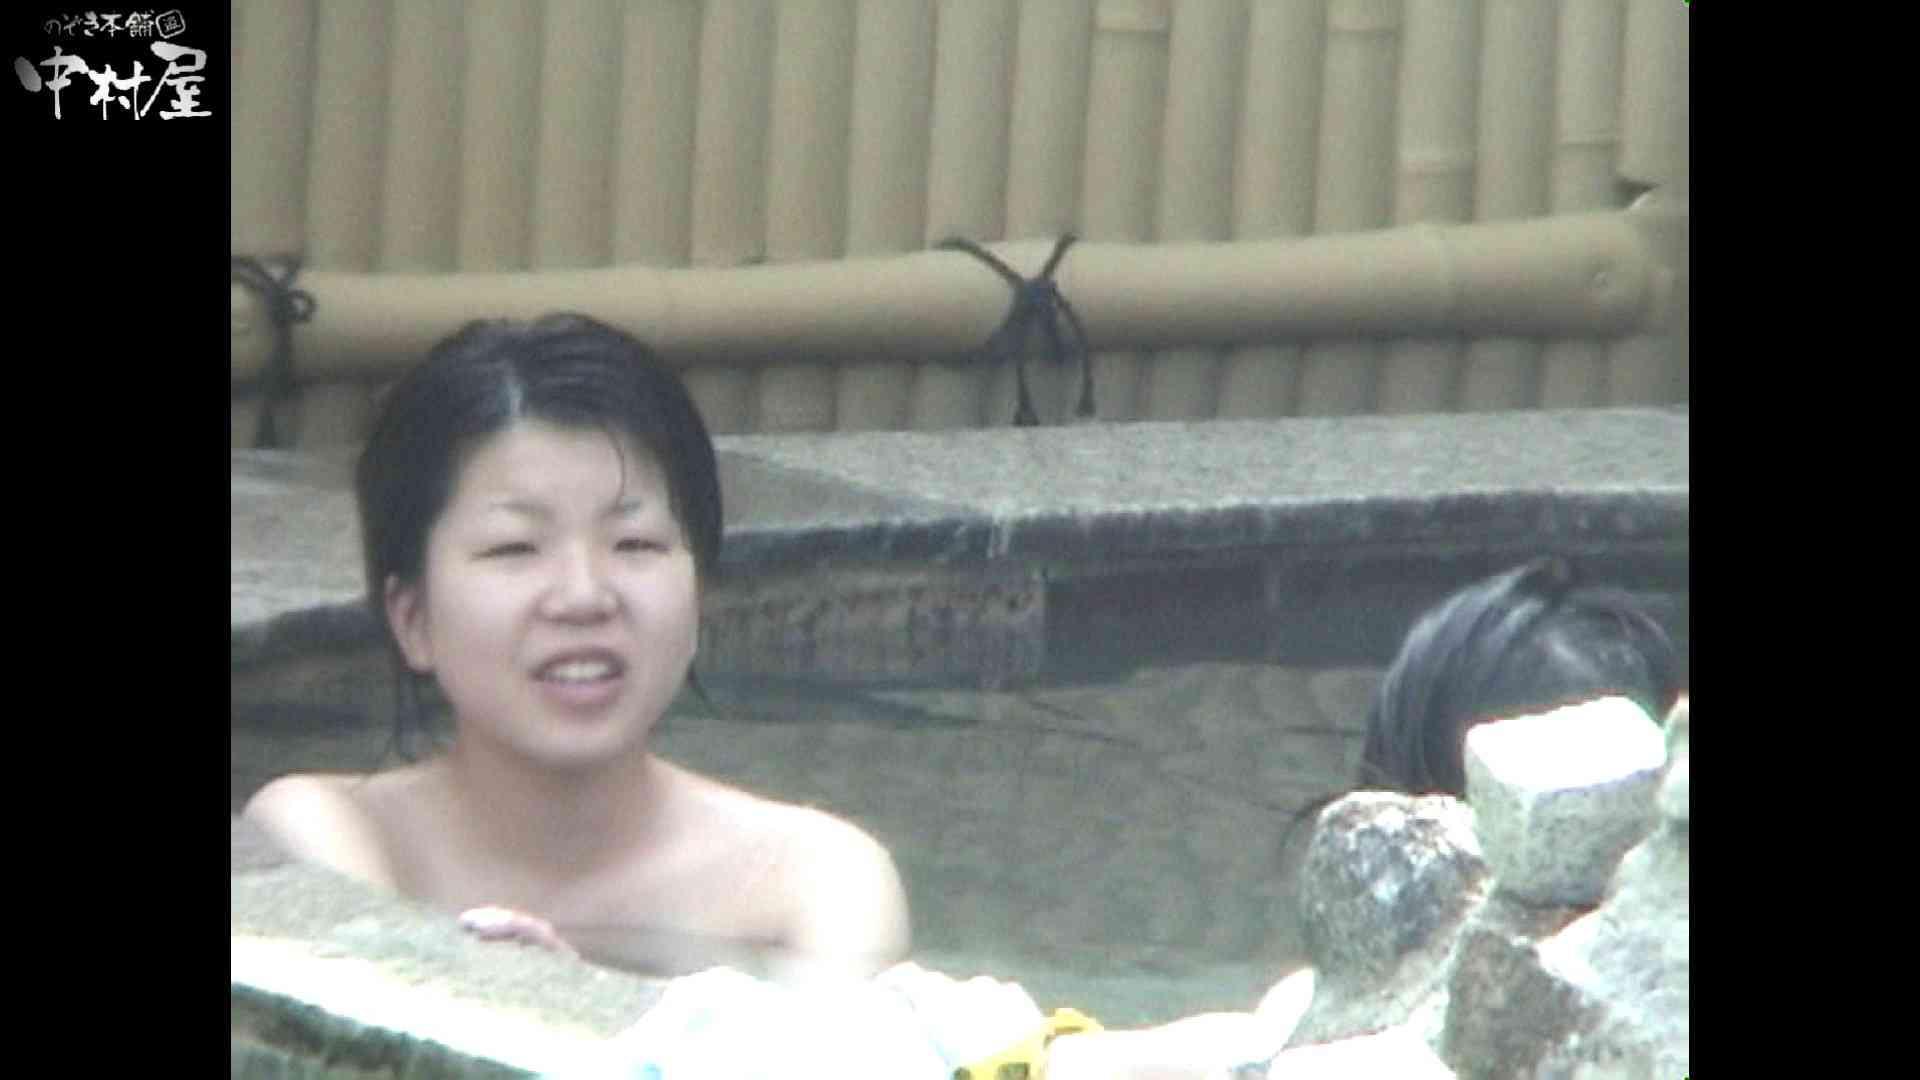 Aquaな露天風呂Vol.936 盗撮映像  110Pix 44